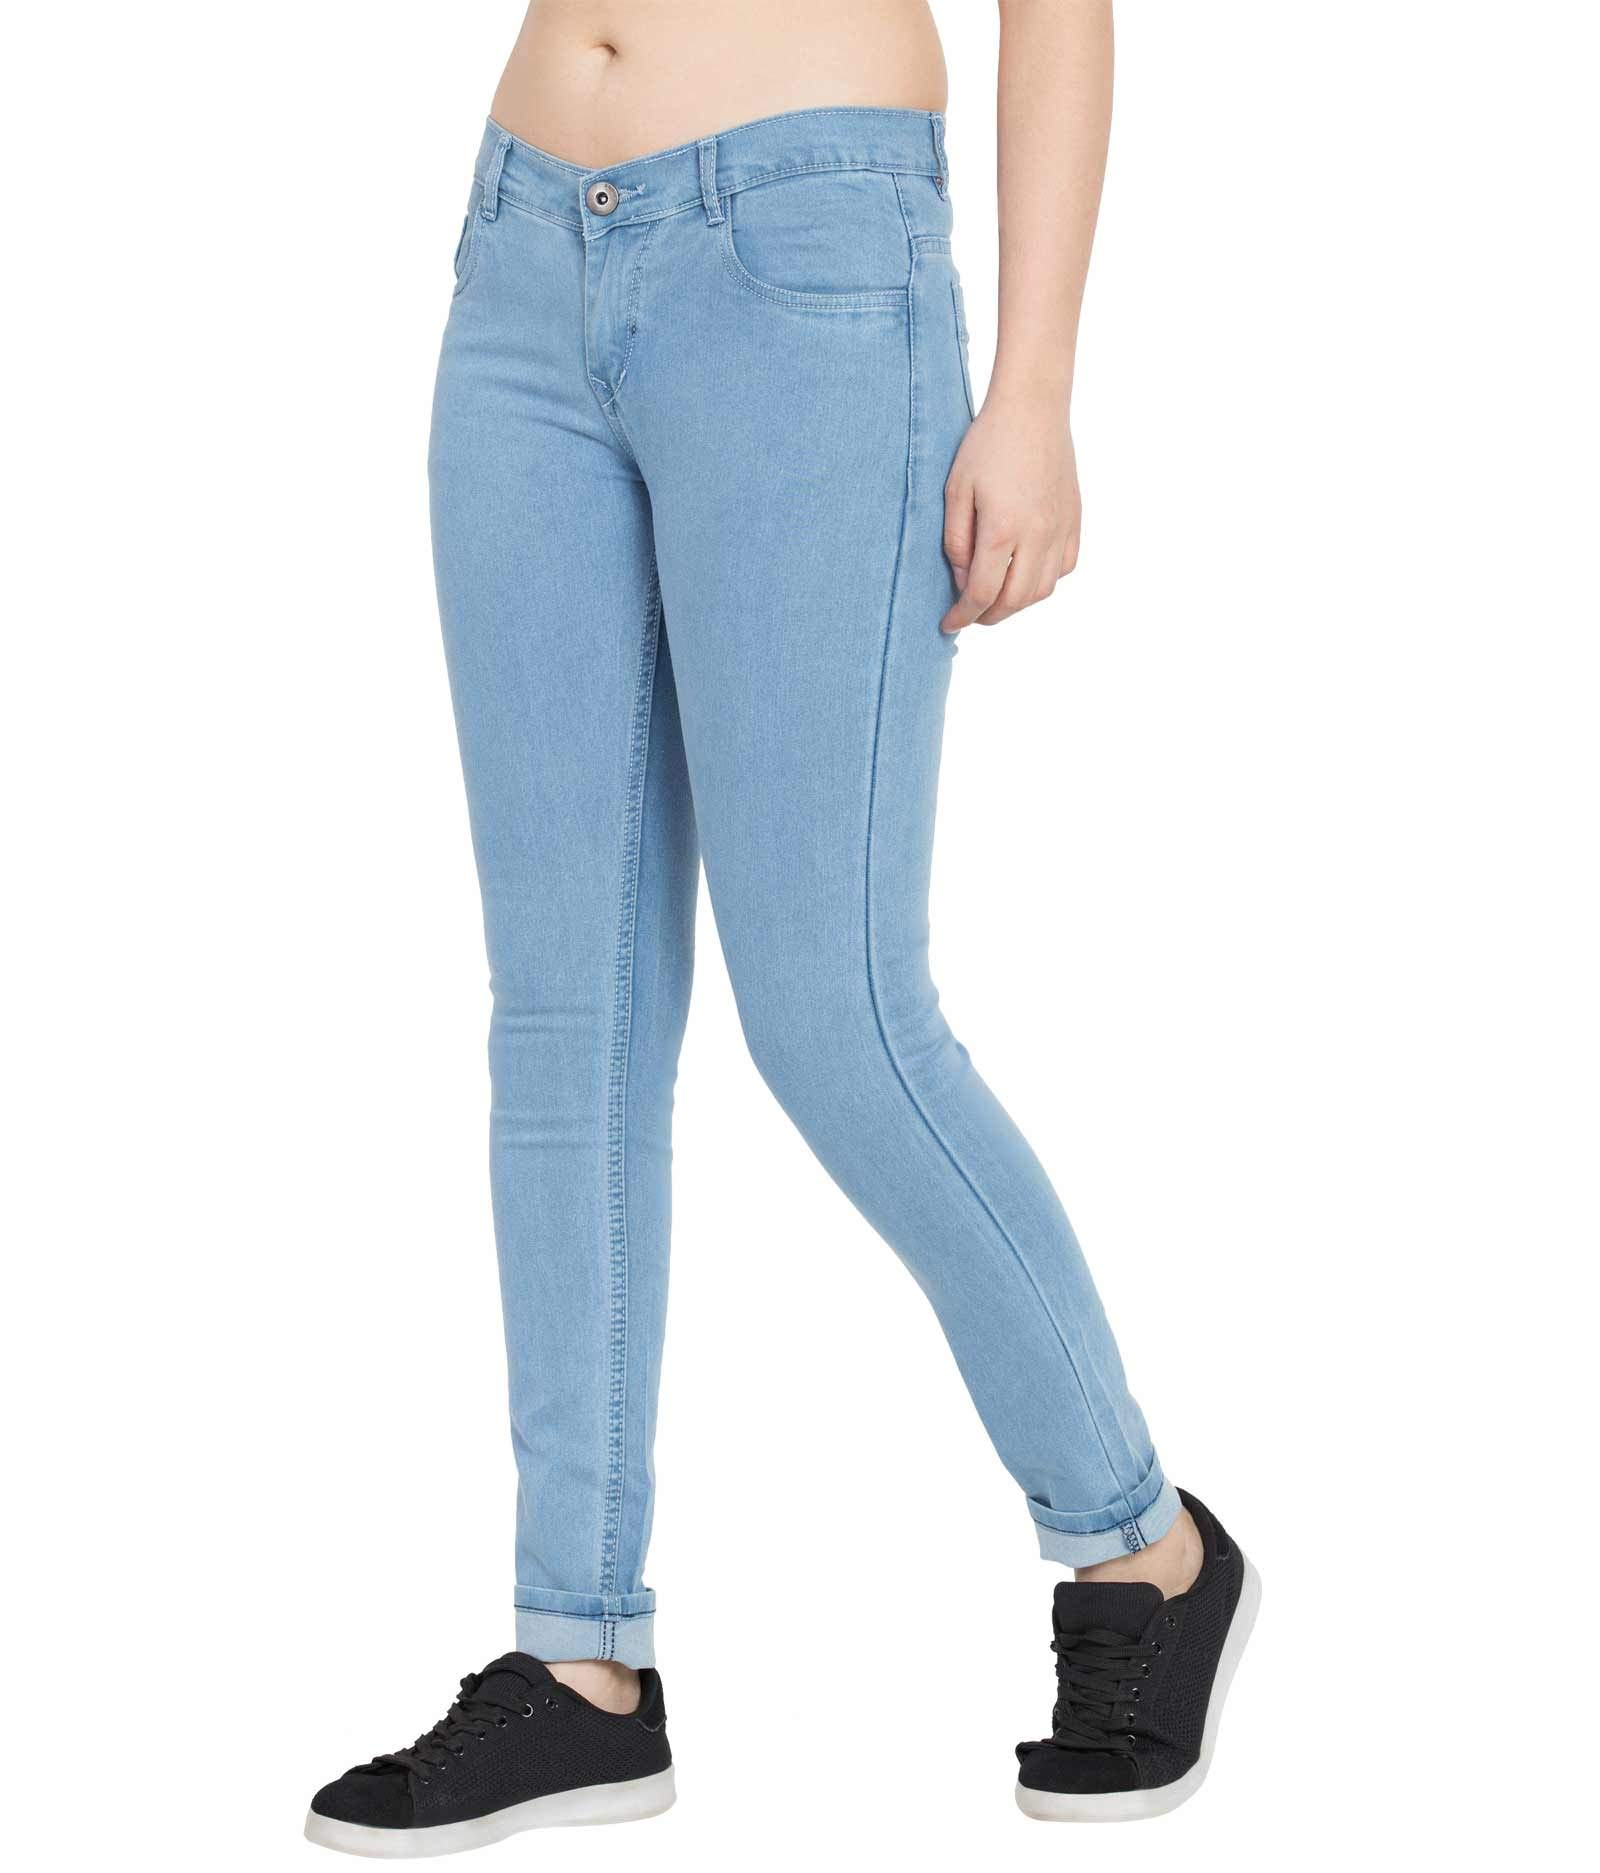 676f7cec8f American-Elm Women s Basic Slim Fit Stretchable Light Blue Jeans ...